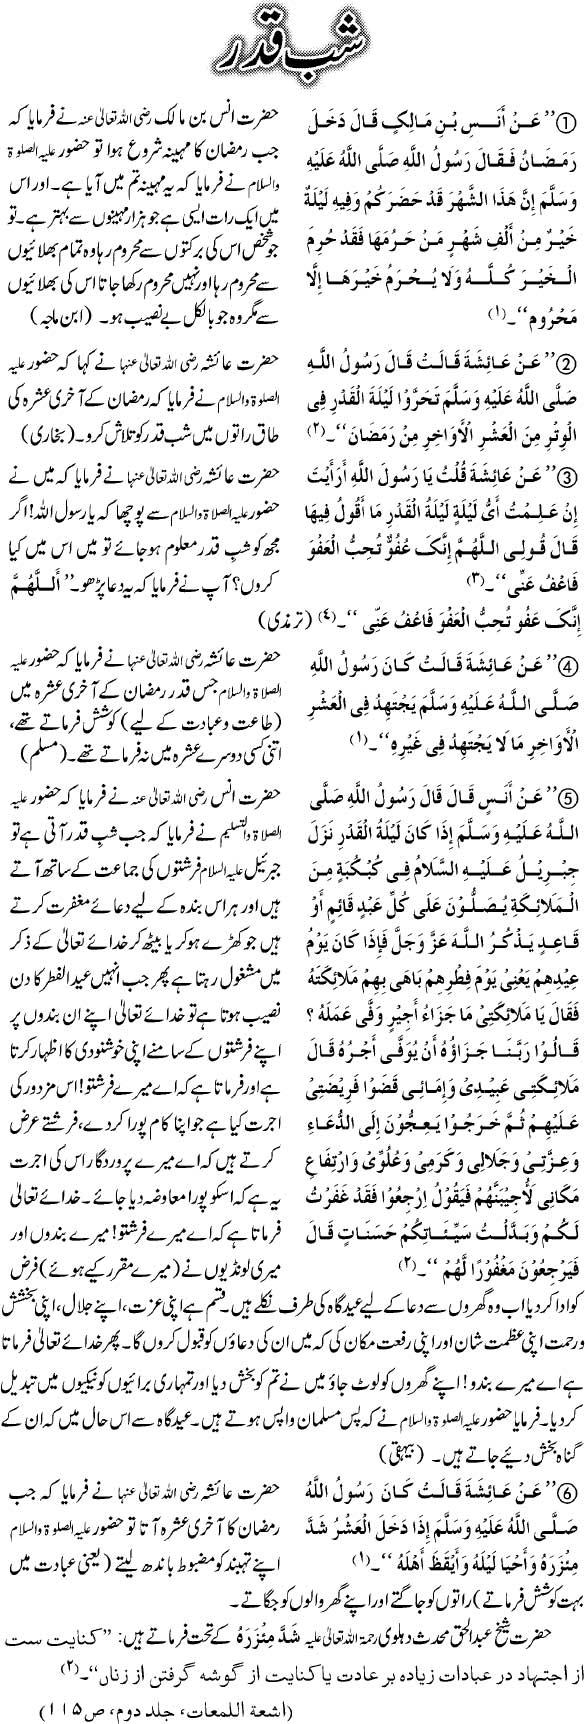 Shab e Qadr: Laylat ul Qadr